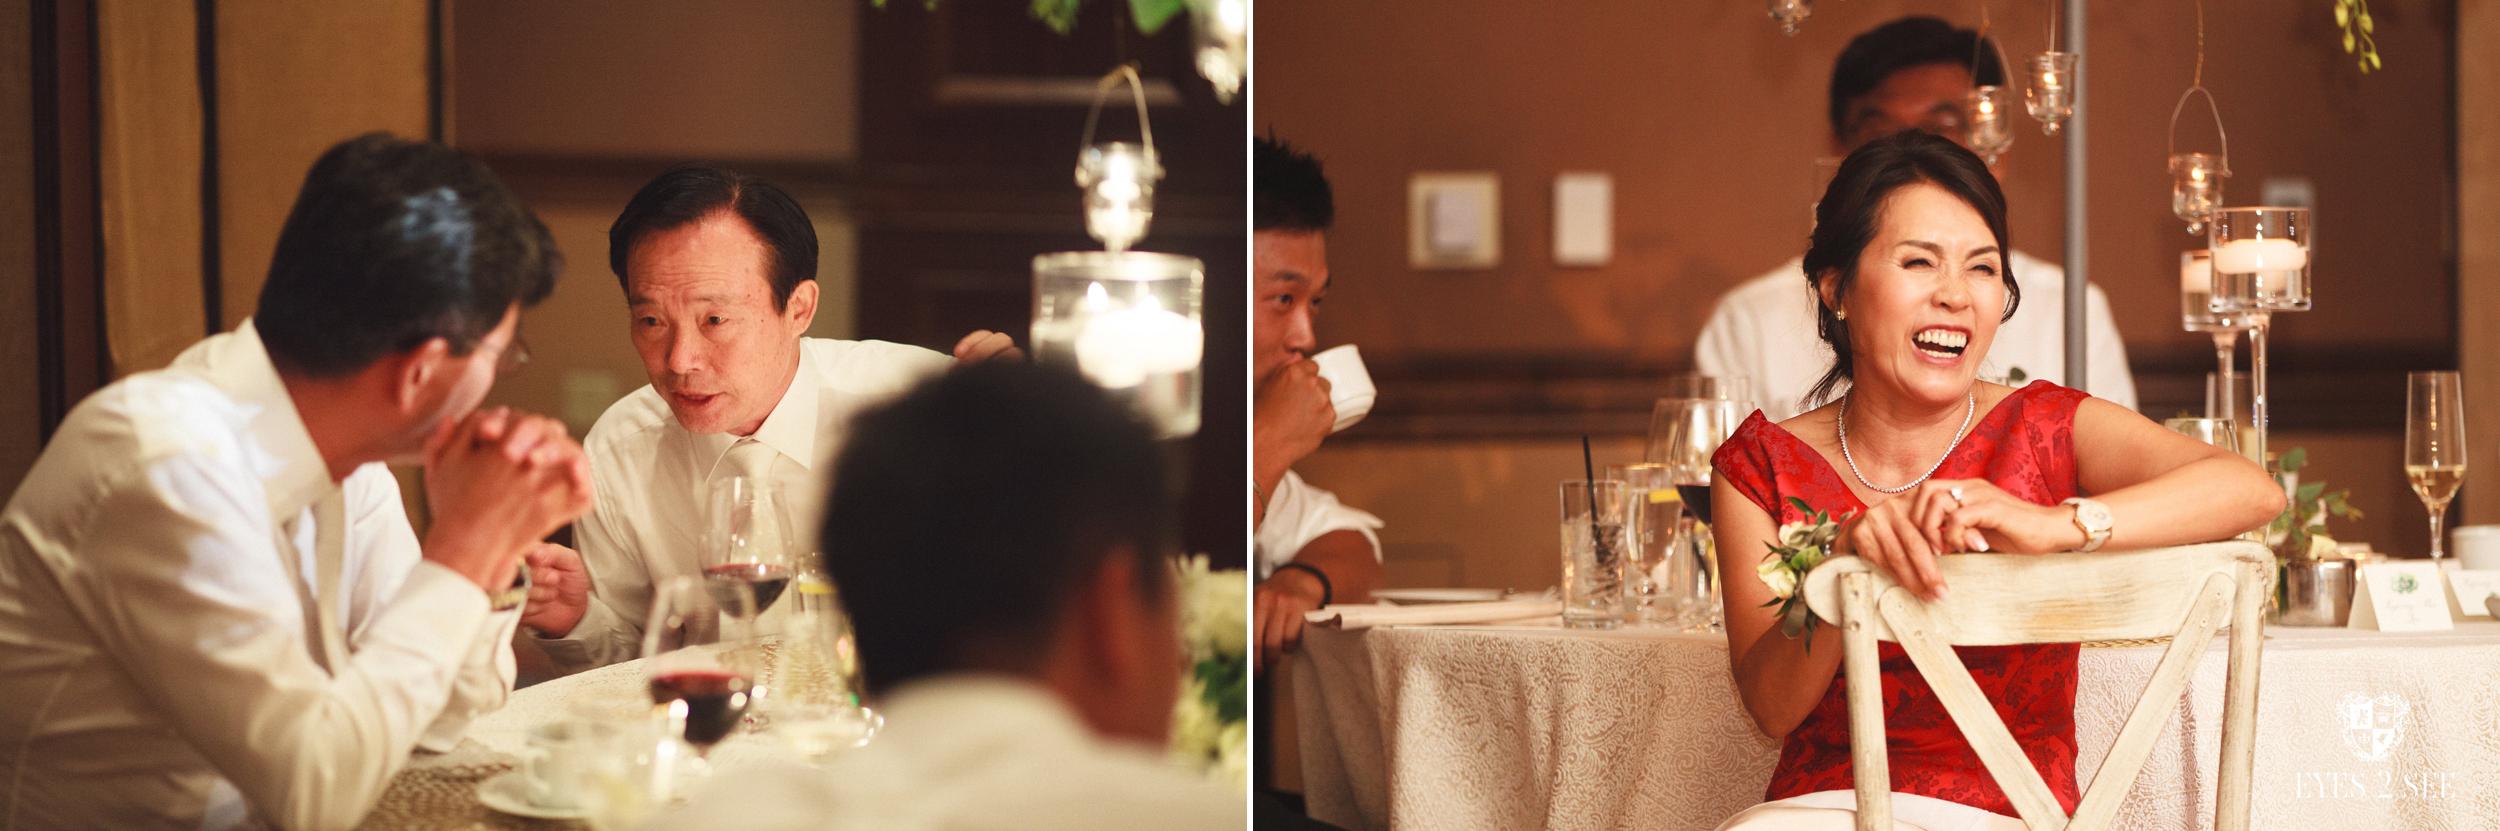 Yongrok_Jeanne_Wedding_Photography060.jpg